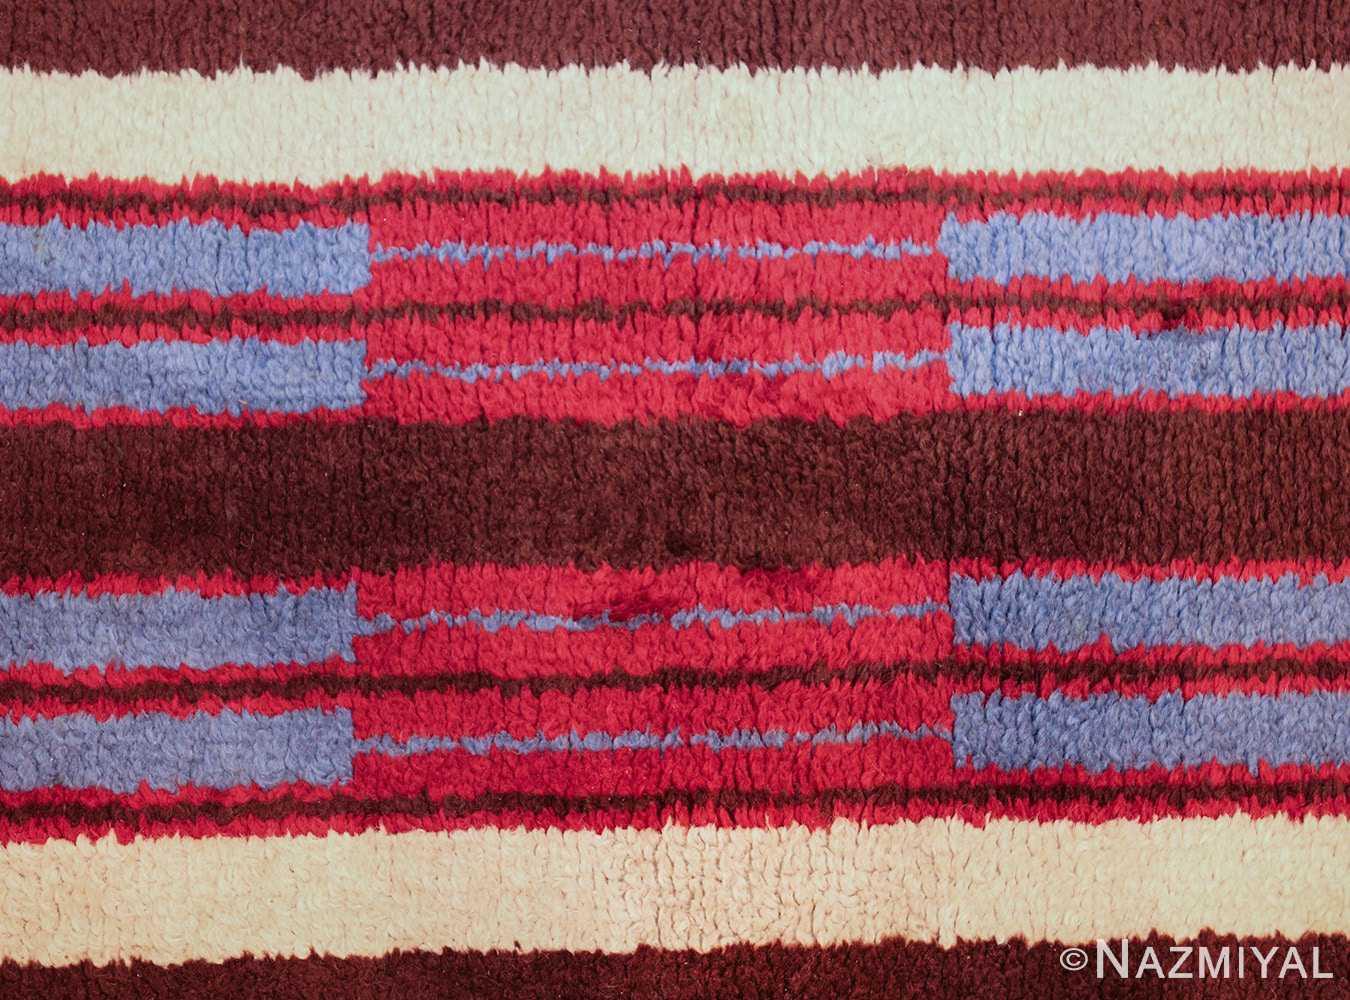 colorful geometric navajo design american rug 49523 center Nazmiyal